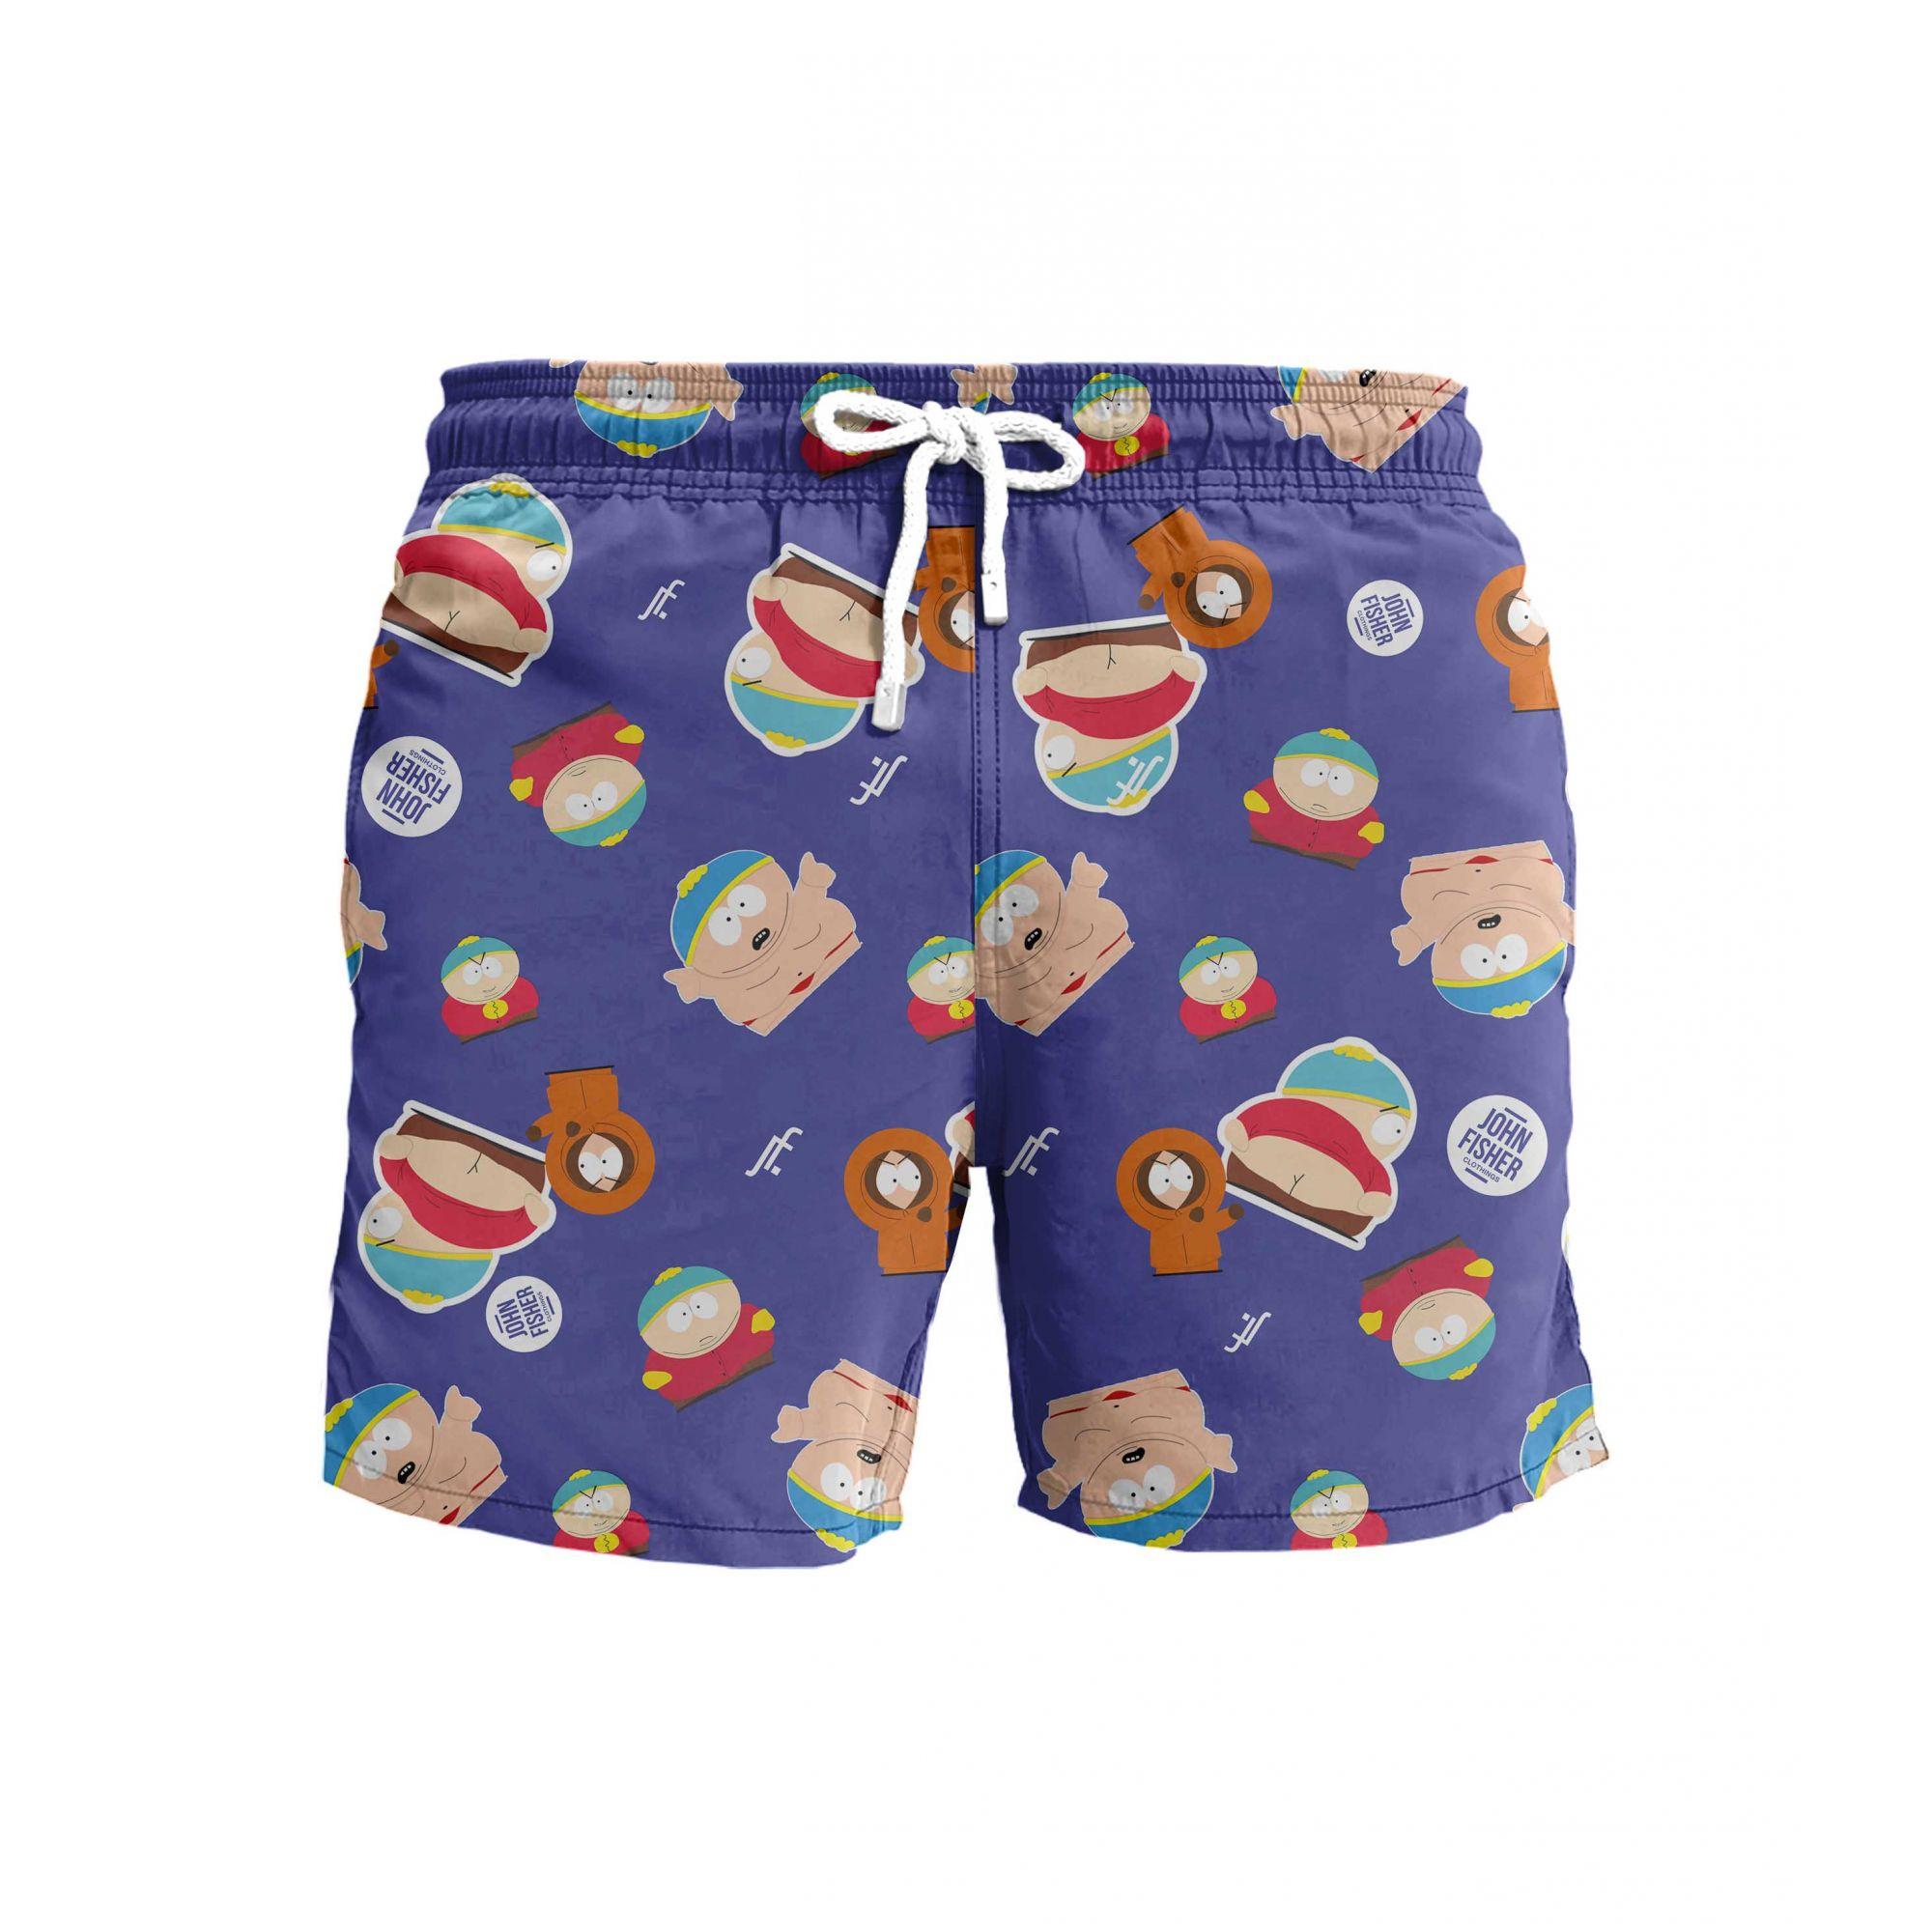 Shorts South Park